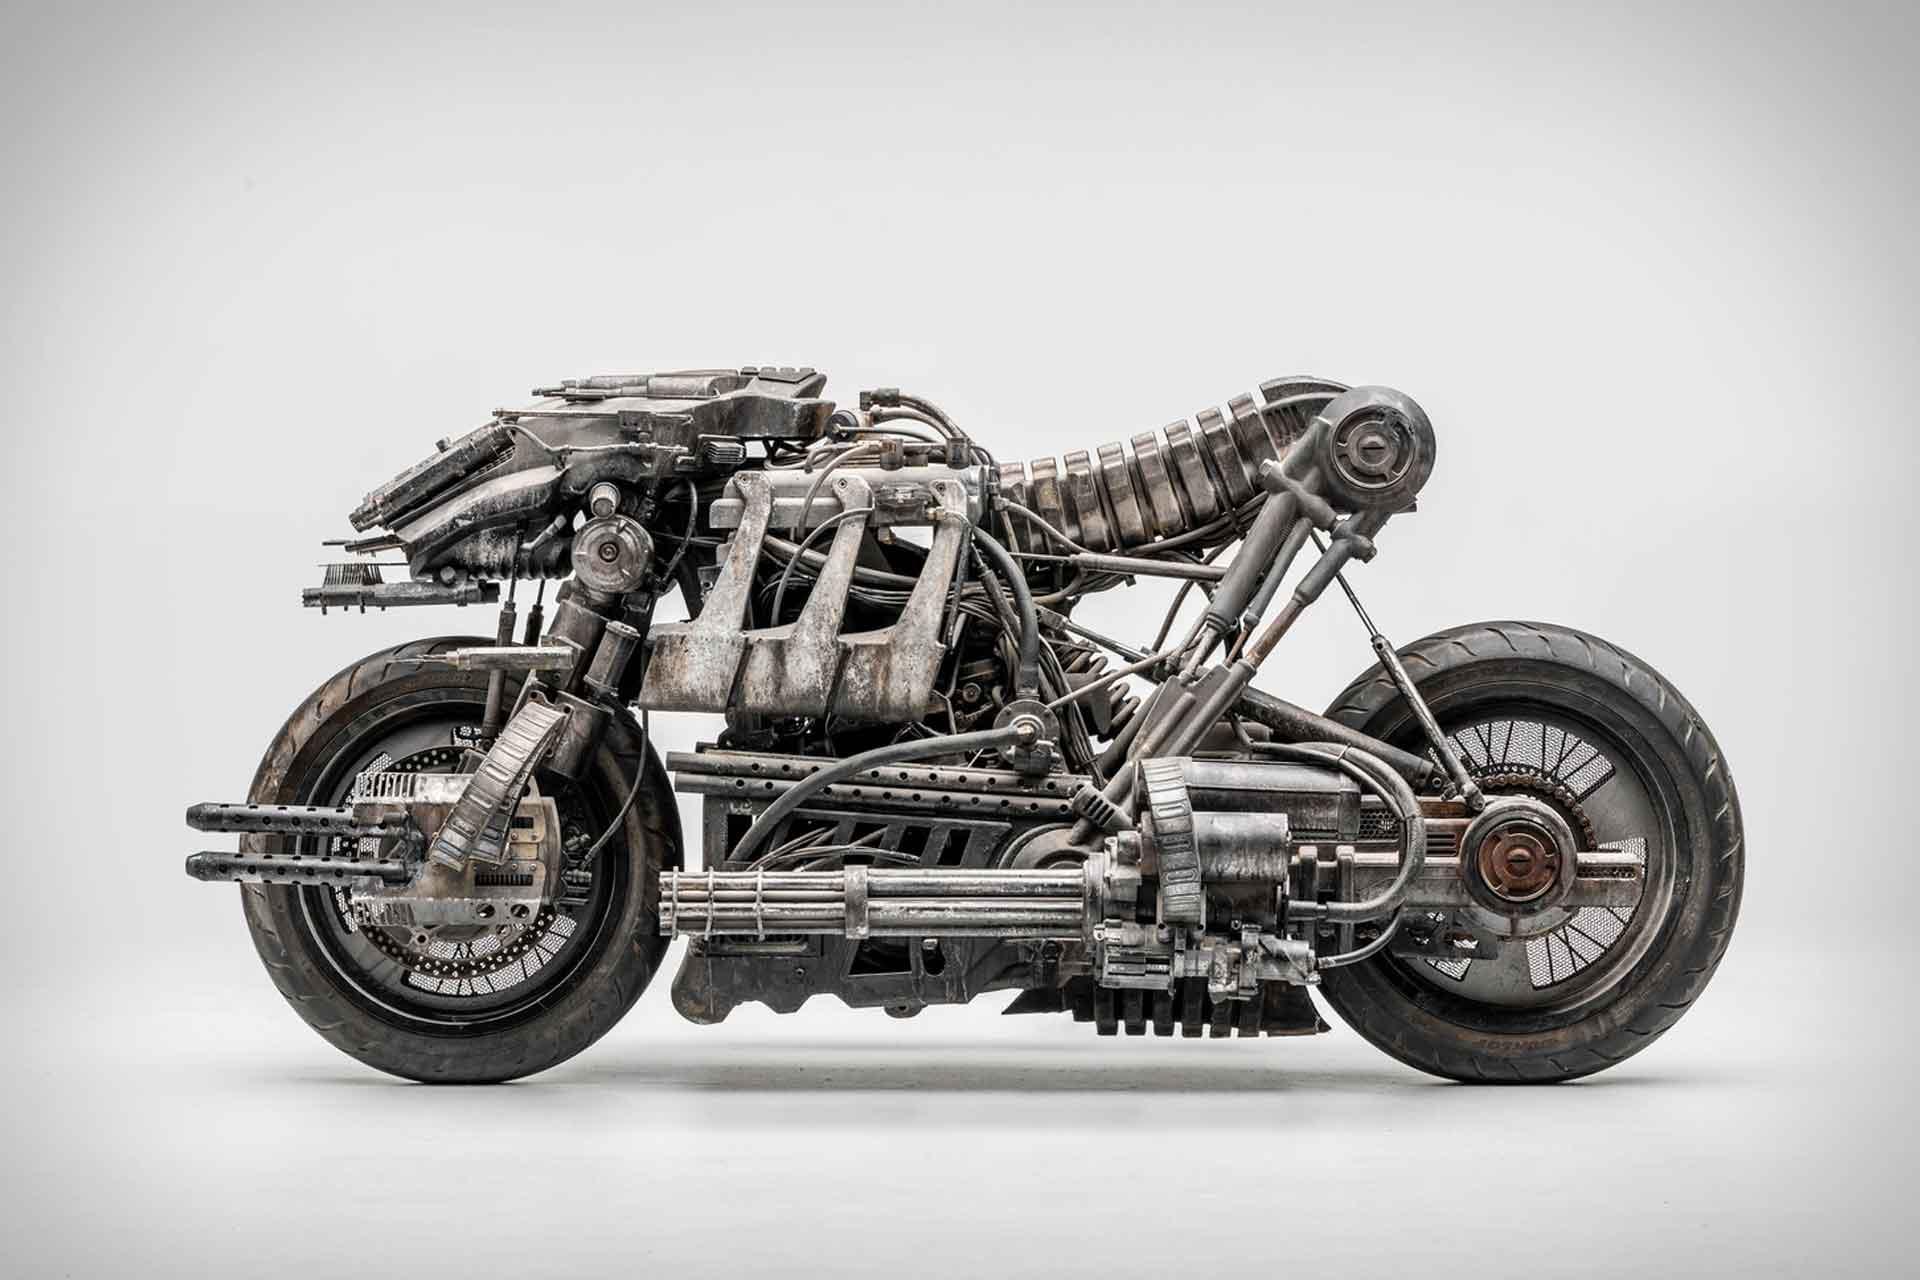 2017 Skynet Moto-Terminator Ducati Motorcycle